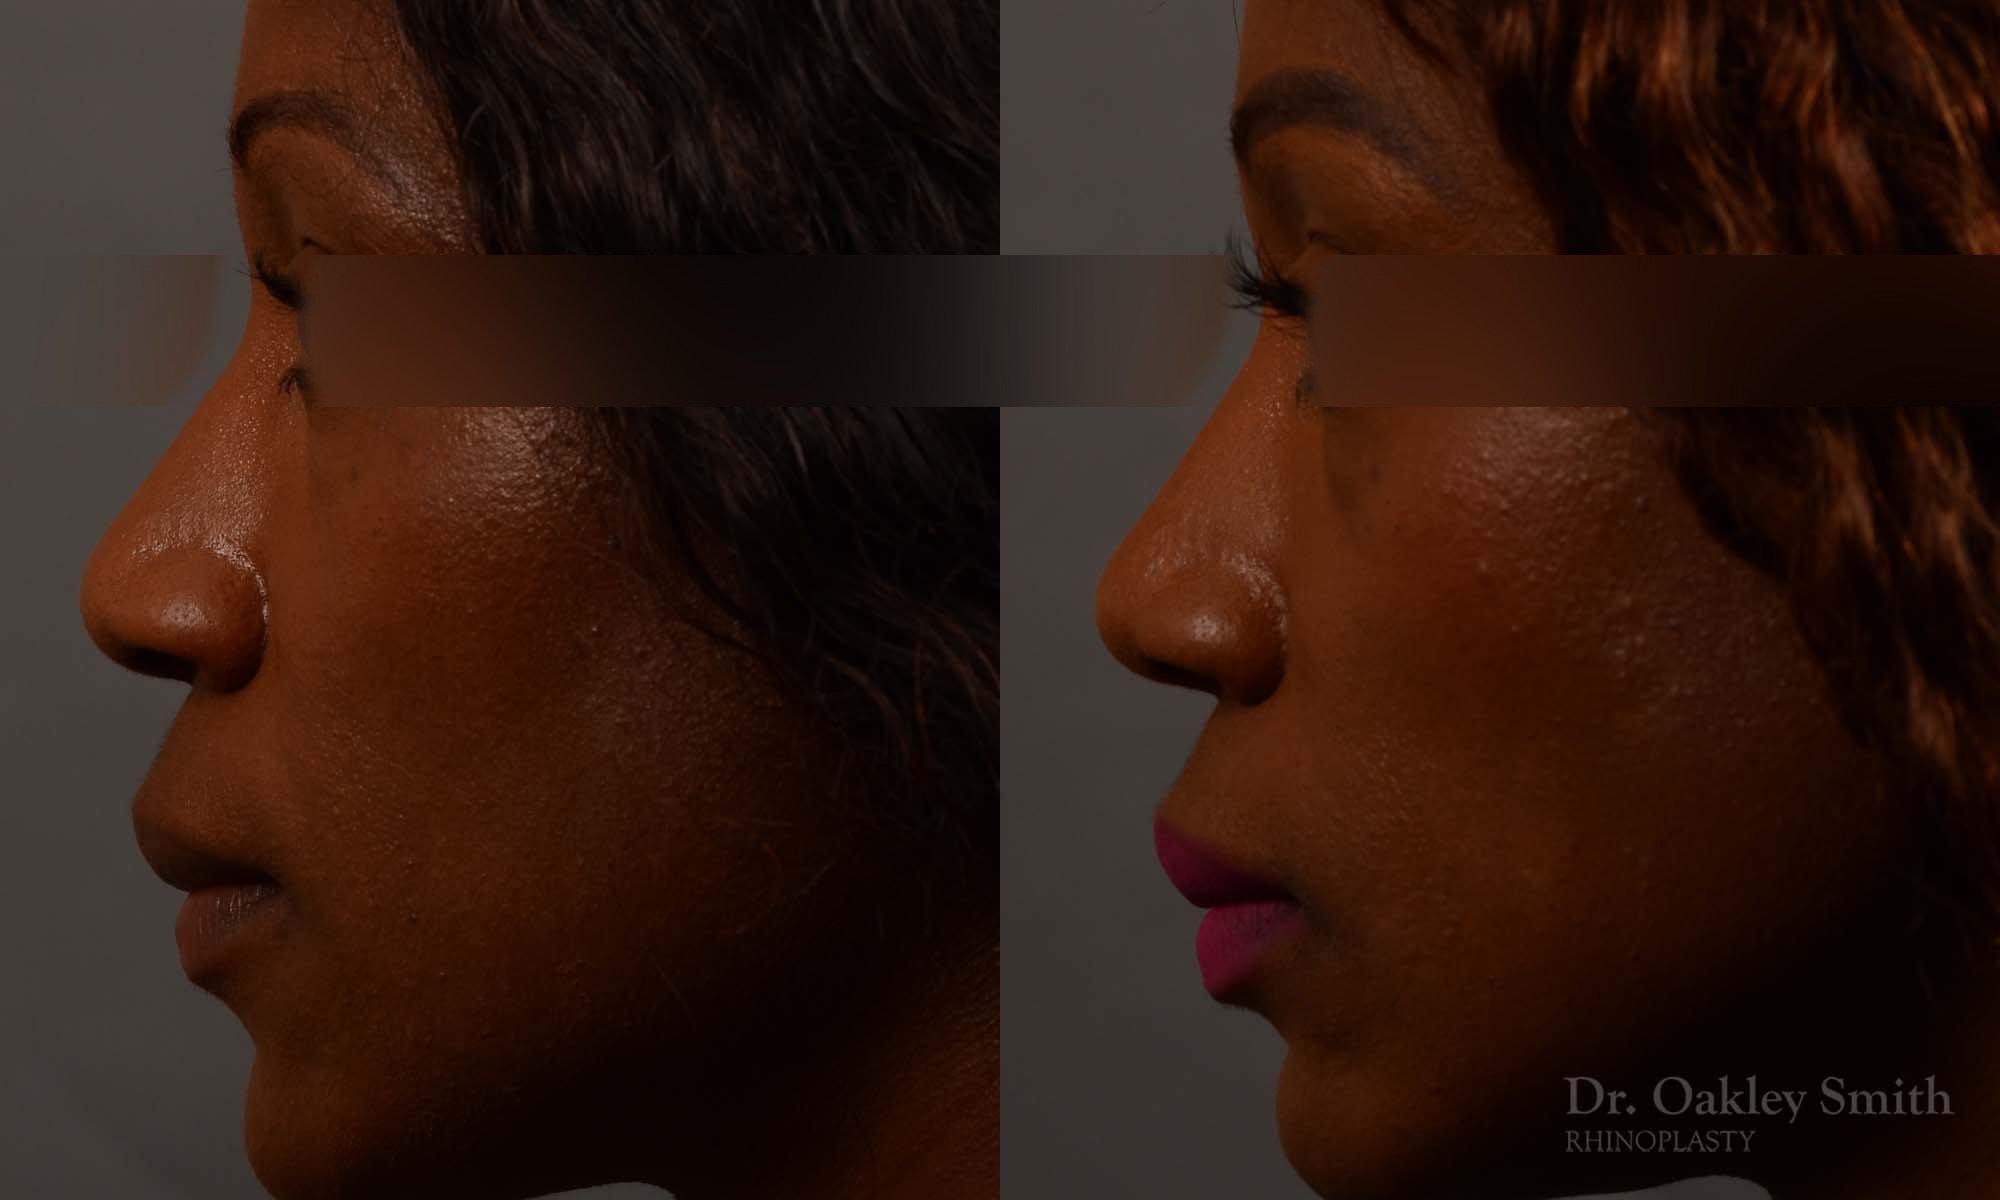 402 rhinoplasty nose job, wide base, dr. oakley smith, toronto